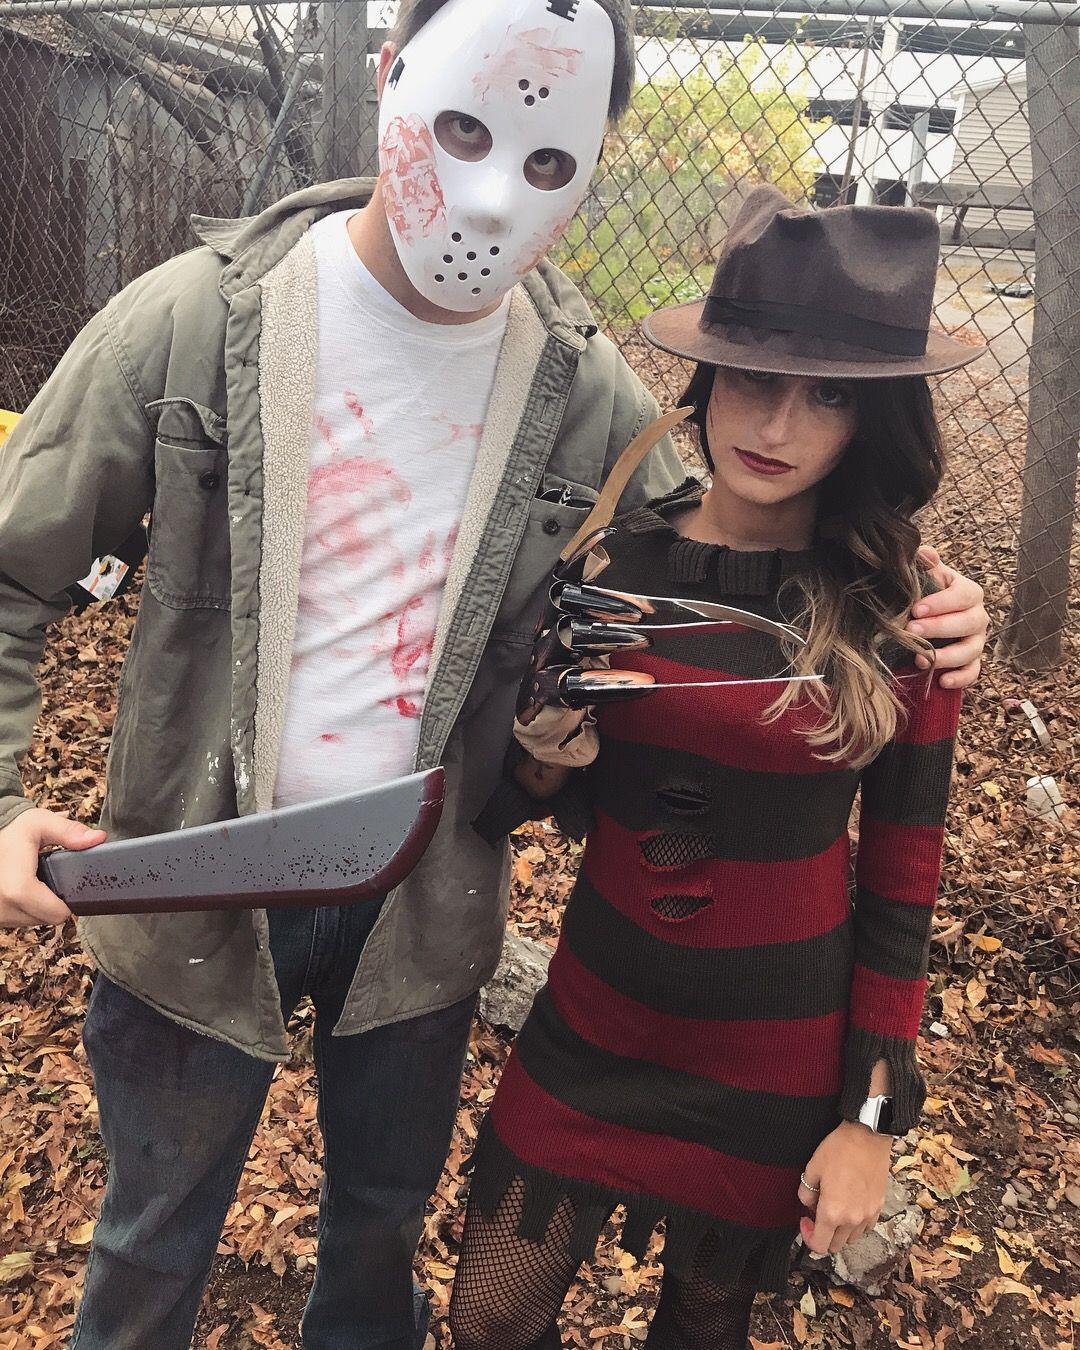 Freddy Vs Jason Couplescostume Halloween Possibilities In